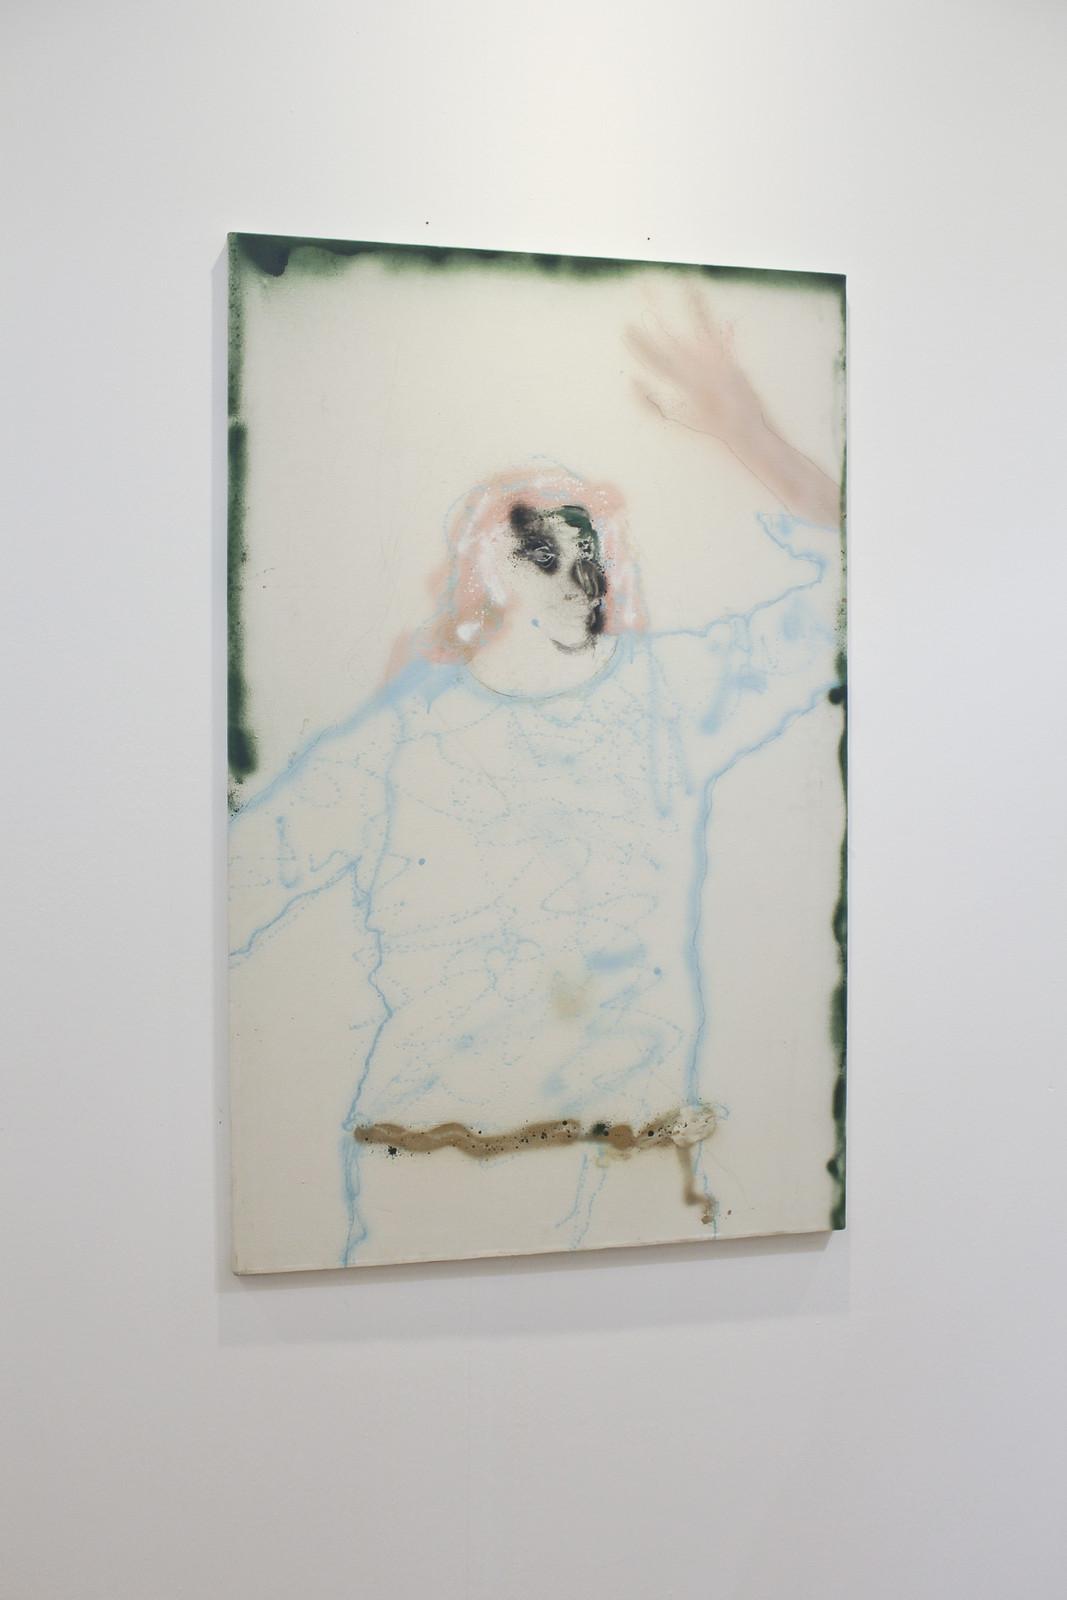 Lynn Hershman Leeson at Vilma Gold, London 01